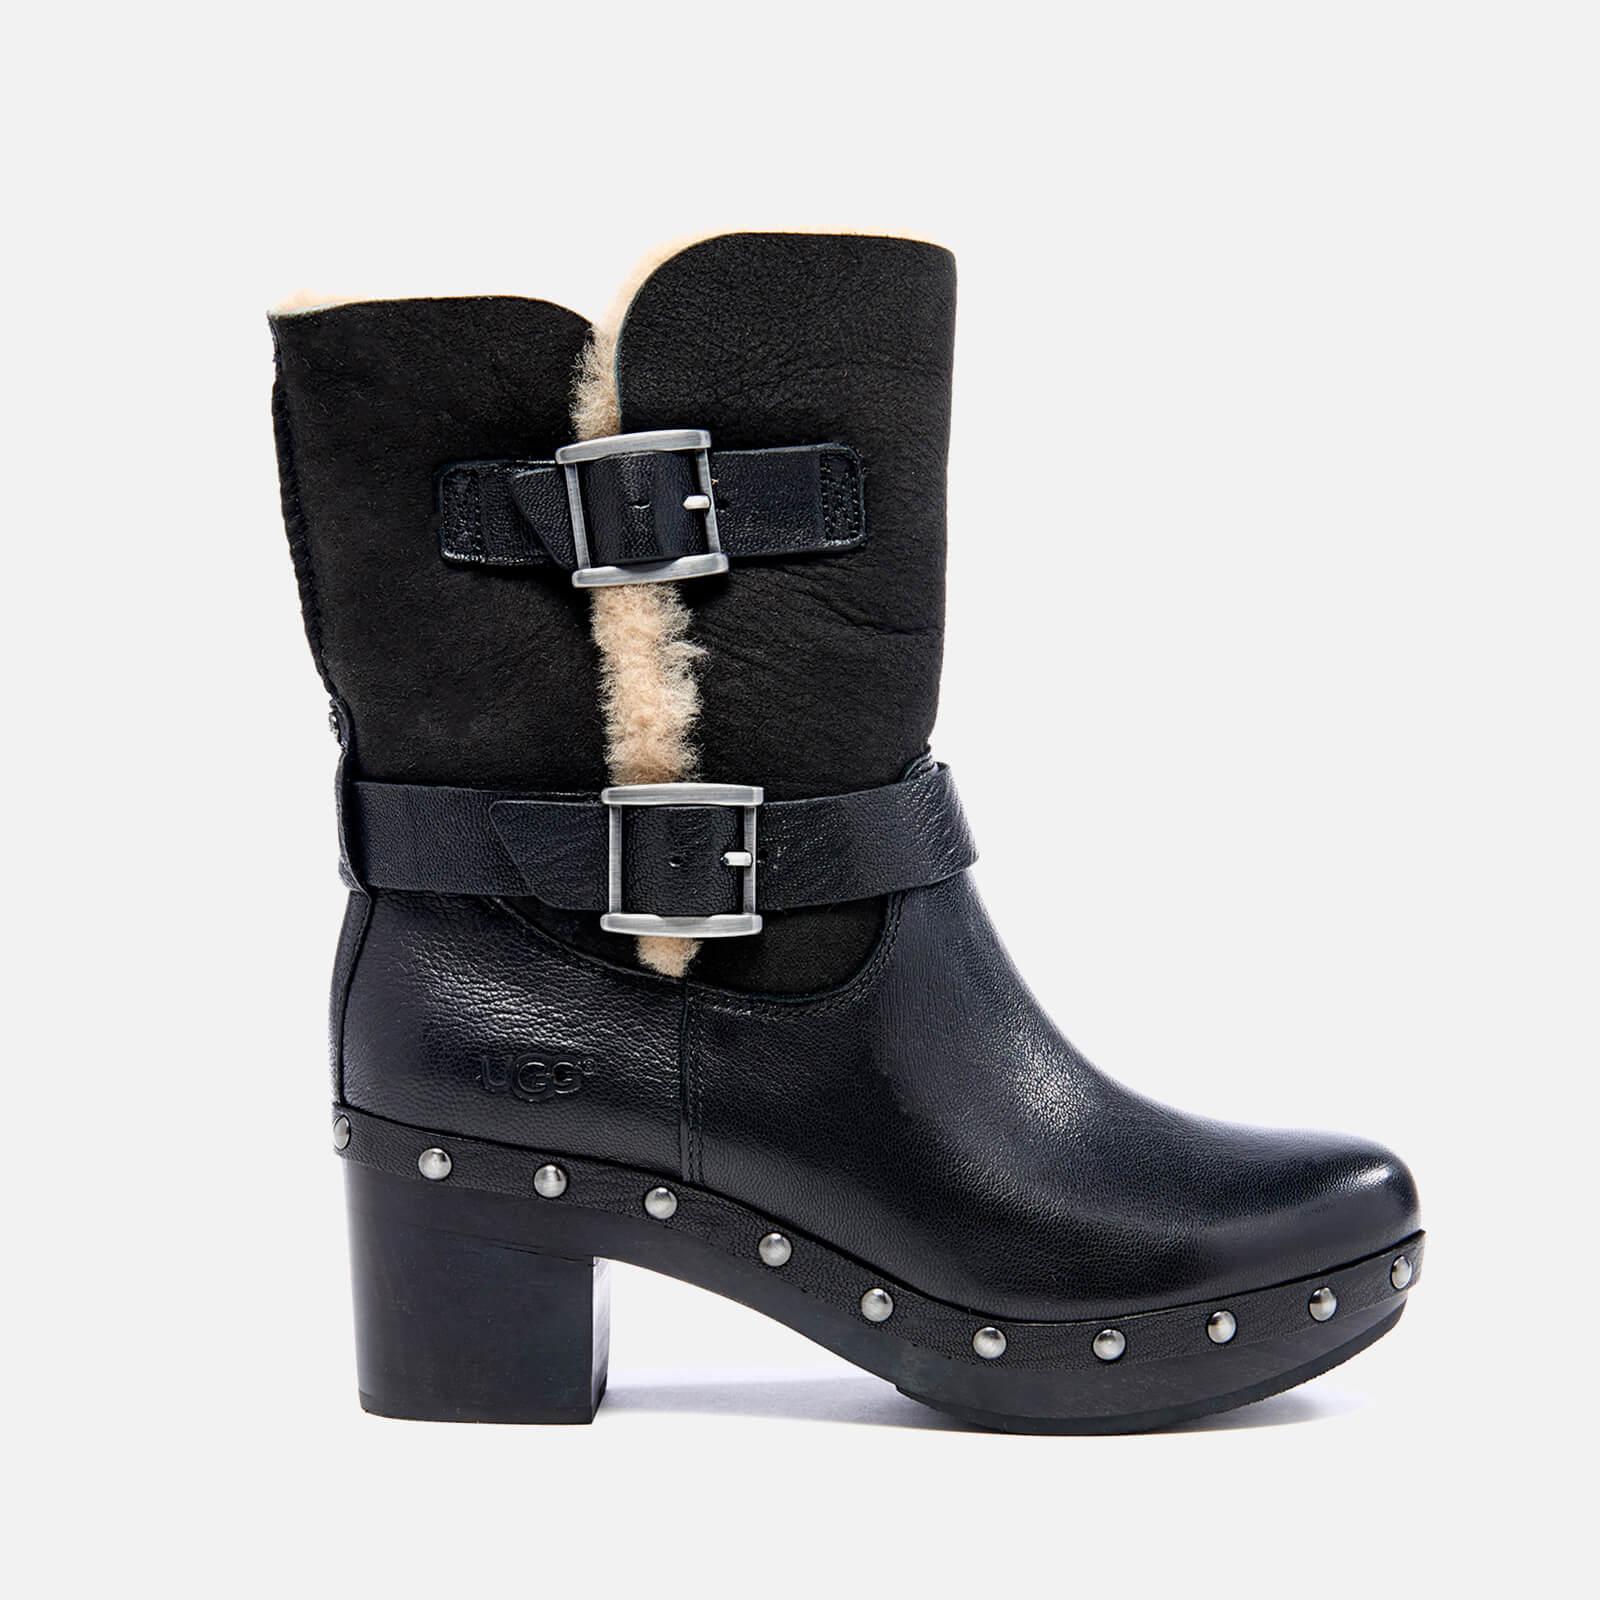 0c687b5d026 UGG Women's Brea Clog Suede Buckle Boots - Black